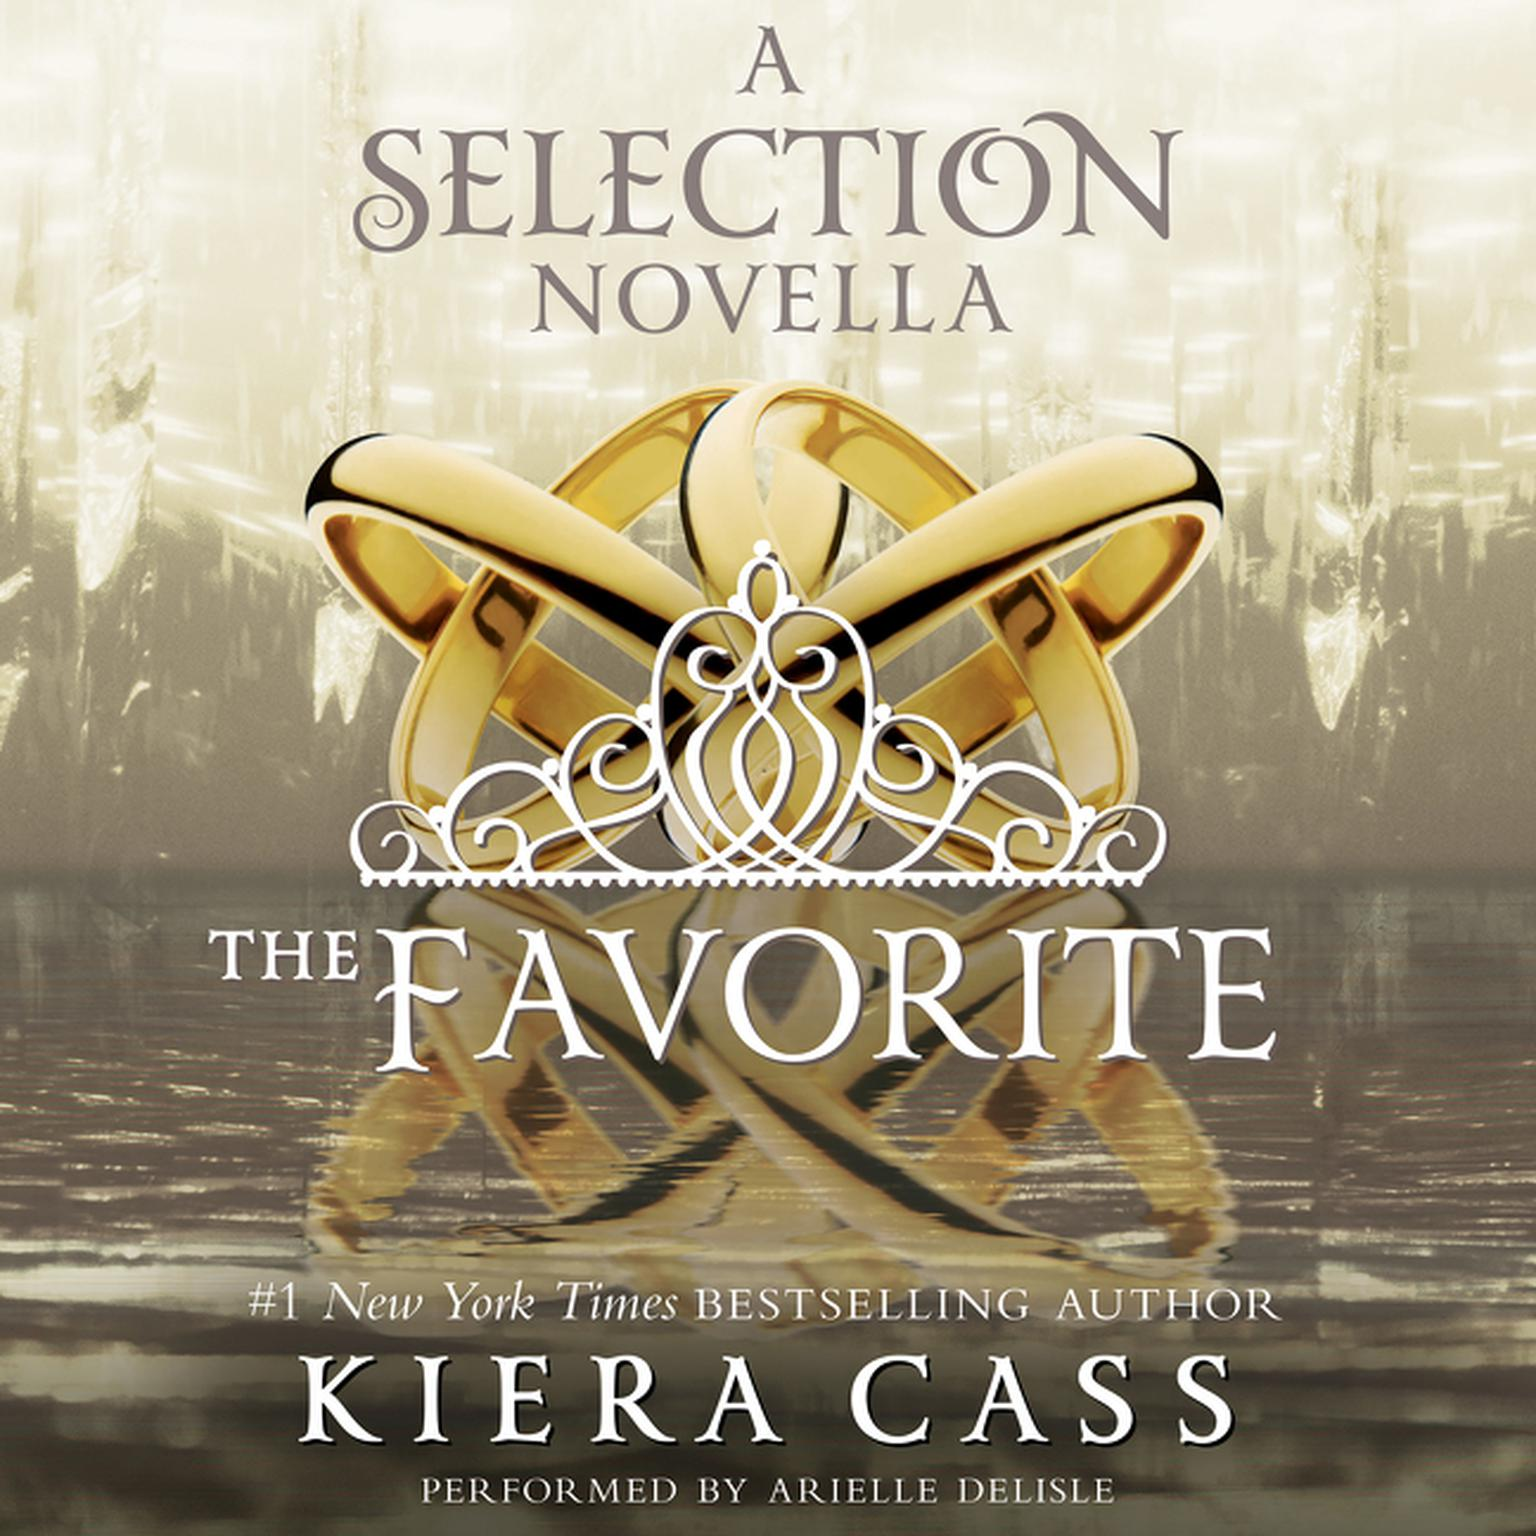 The Favorite: A Novella Audiobook, by Kiera Cass